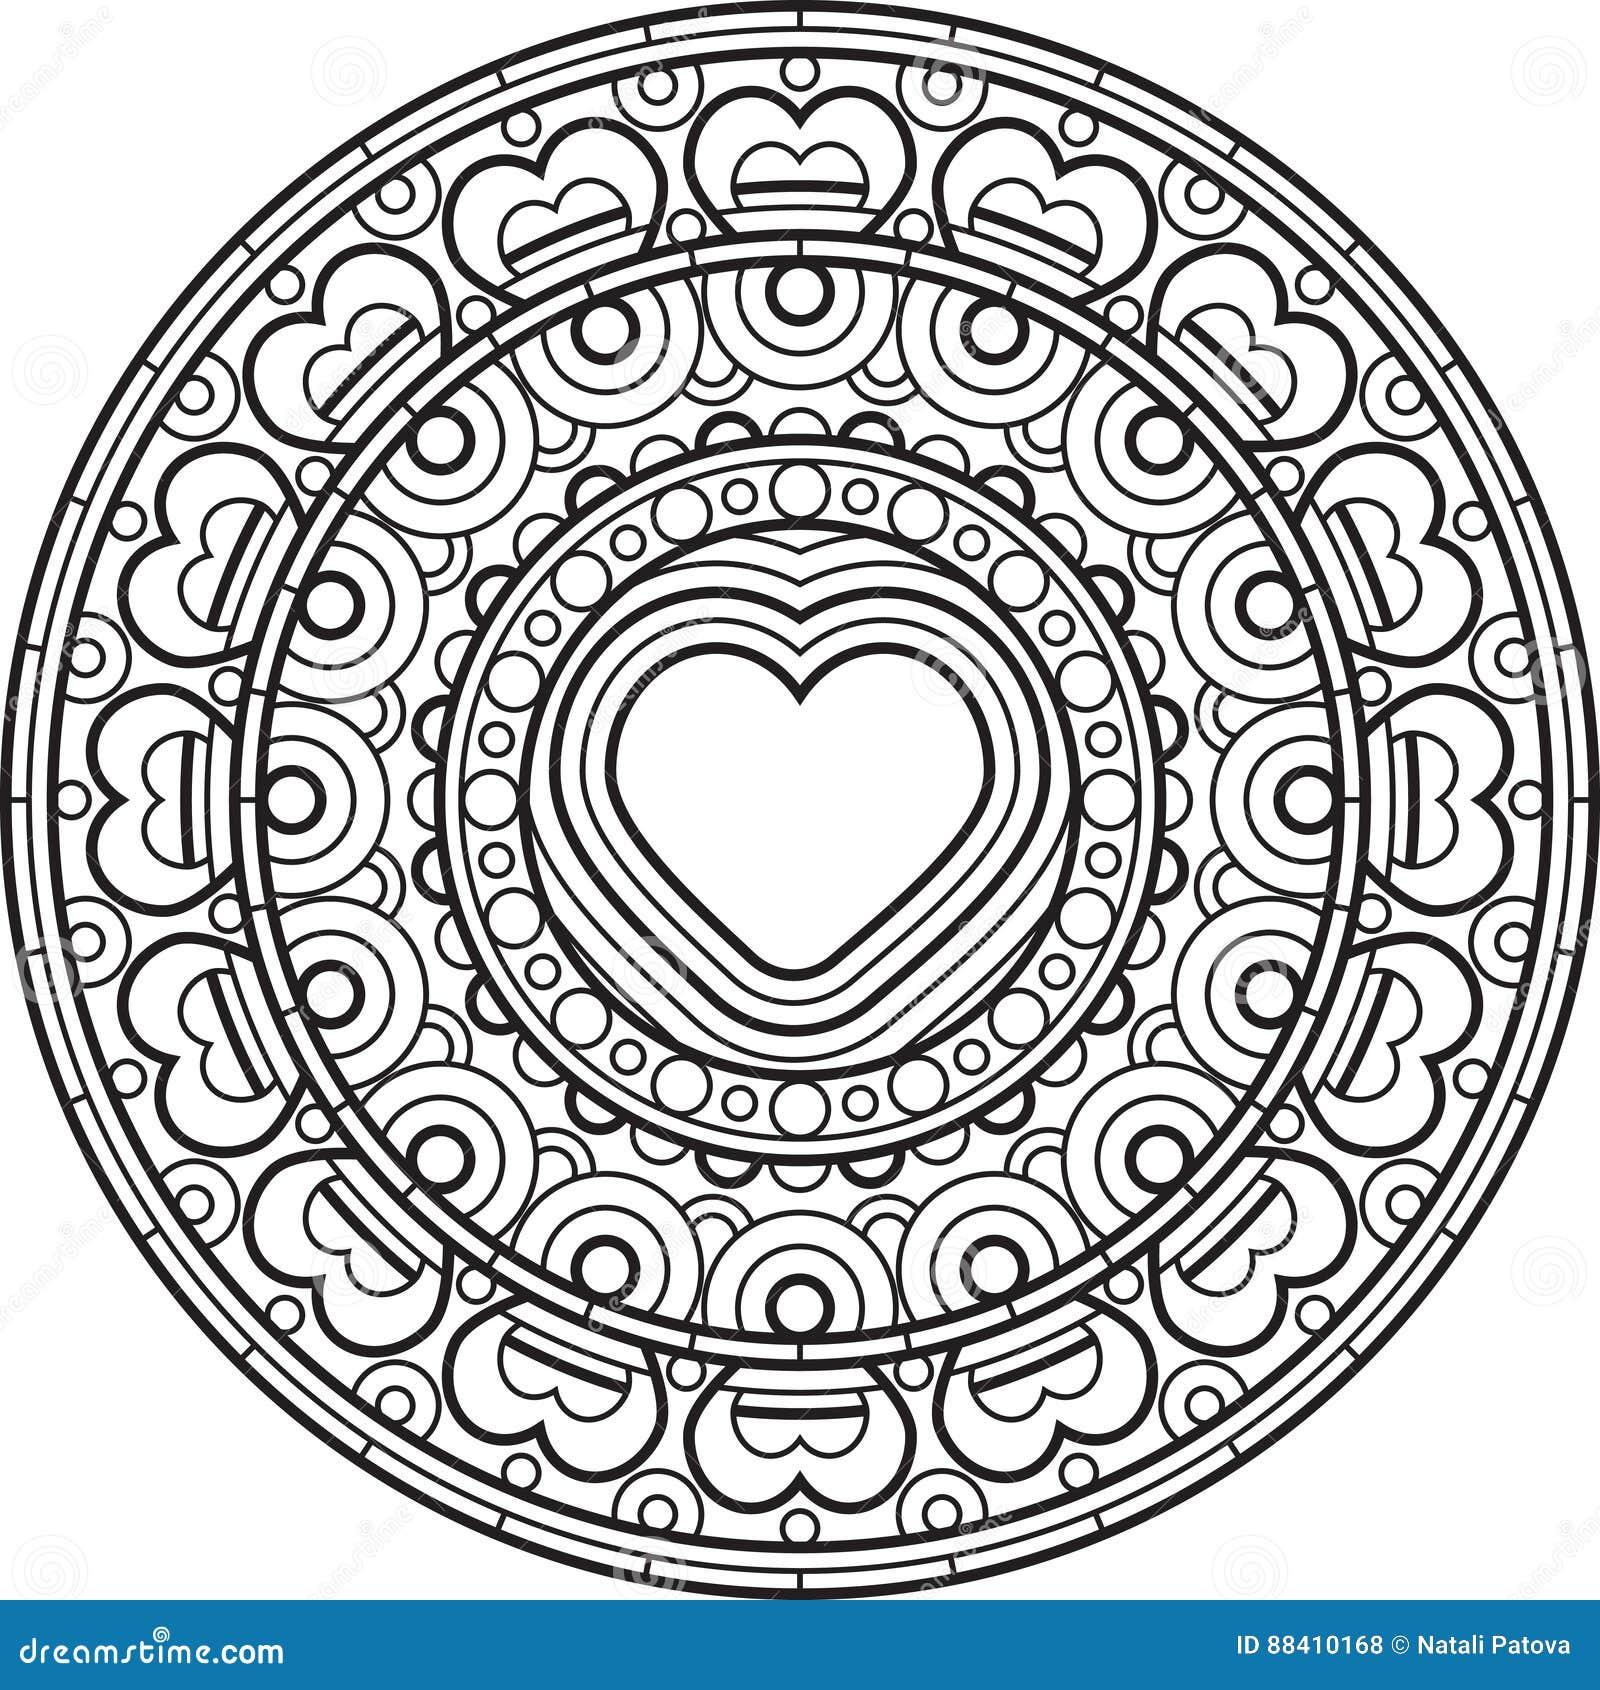 mandala met hart decoratief rond ornament vector